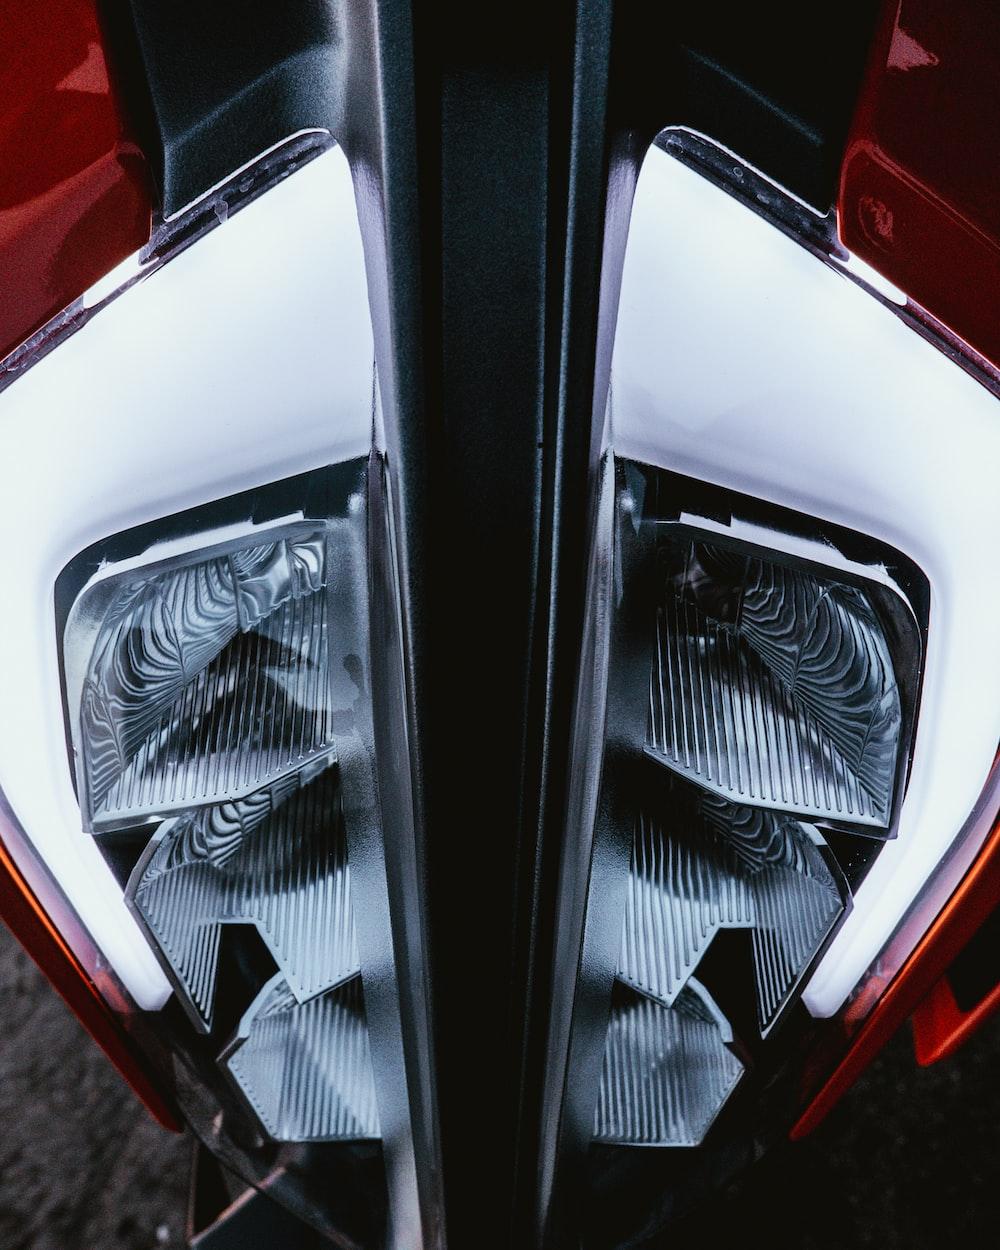 two vehicle headlights